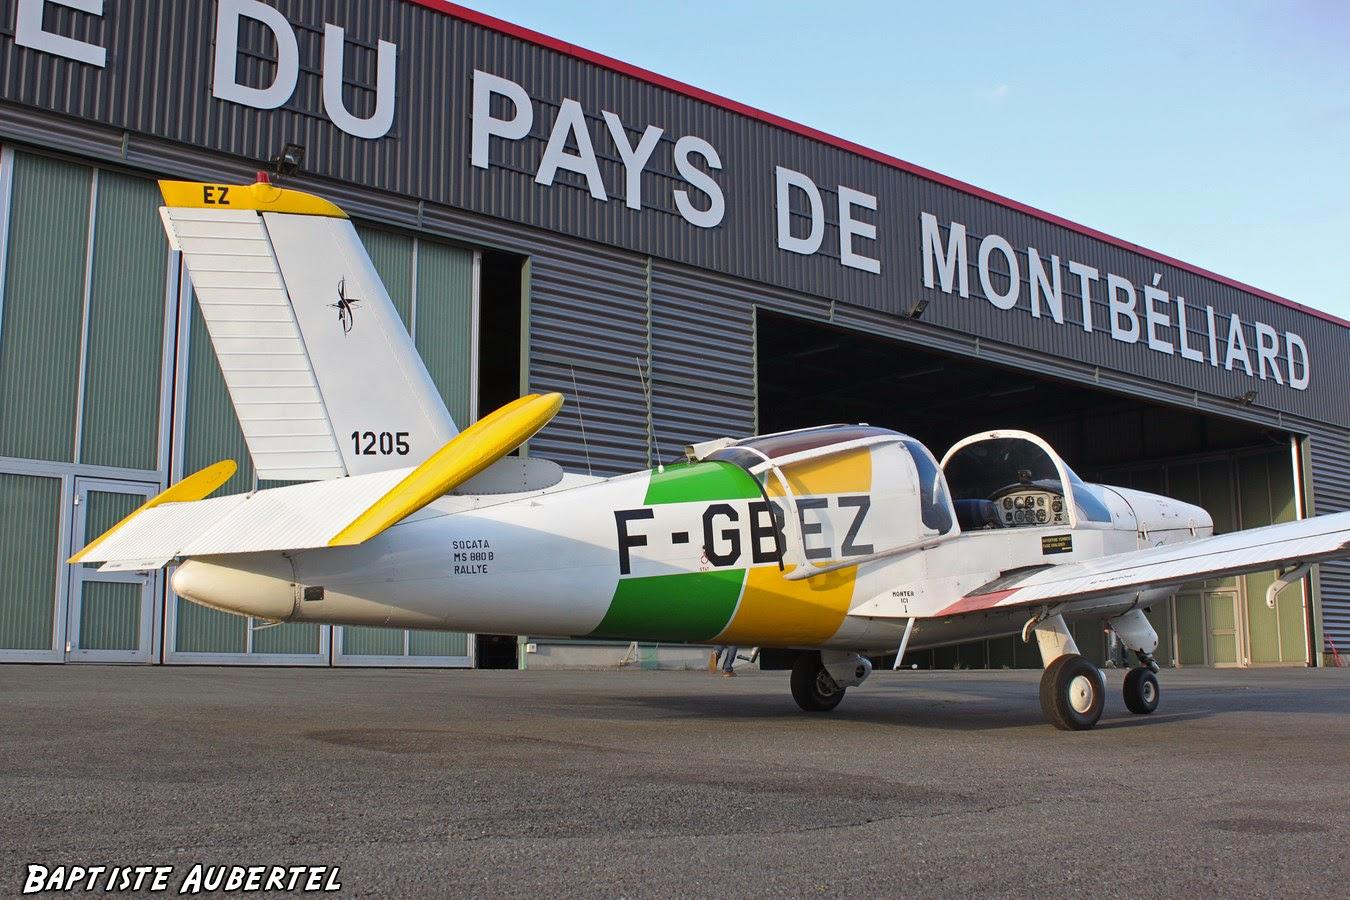 SOCATA Rallye LFSM Montbéliard